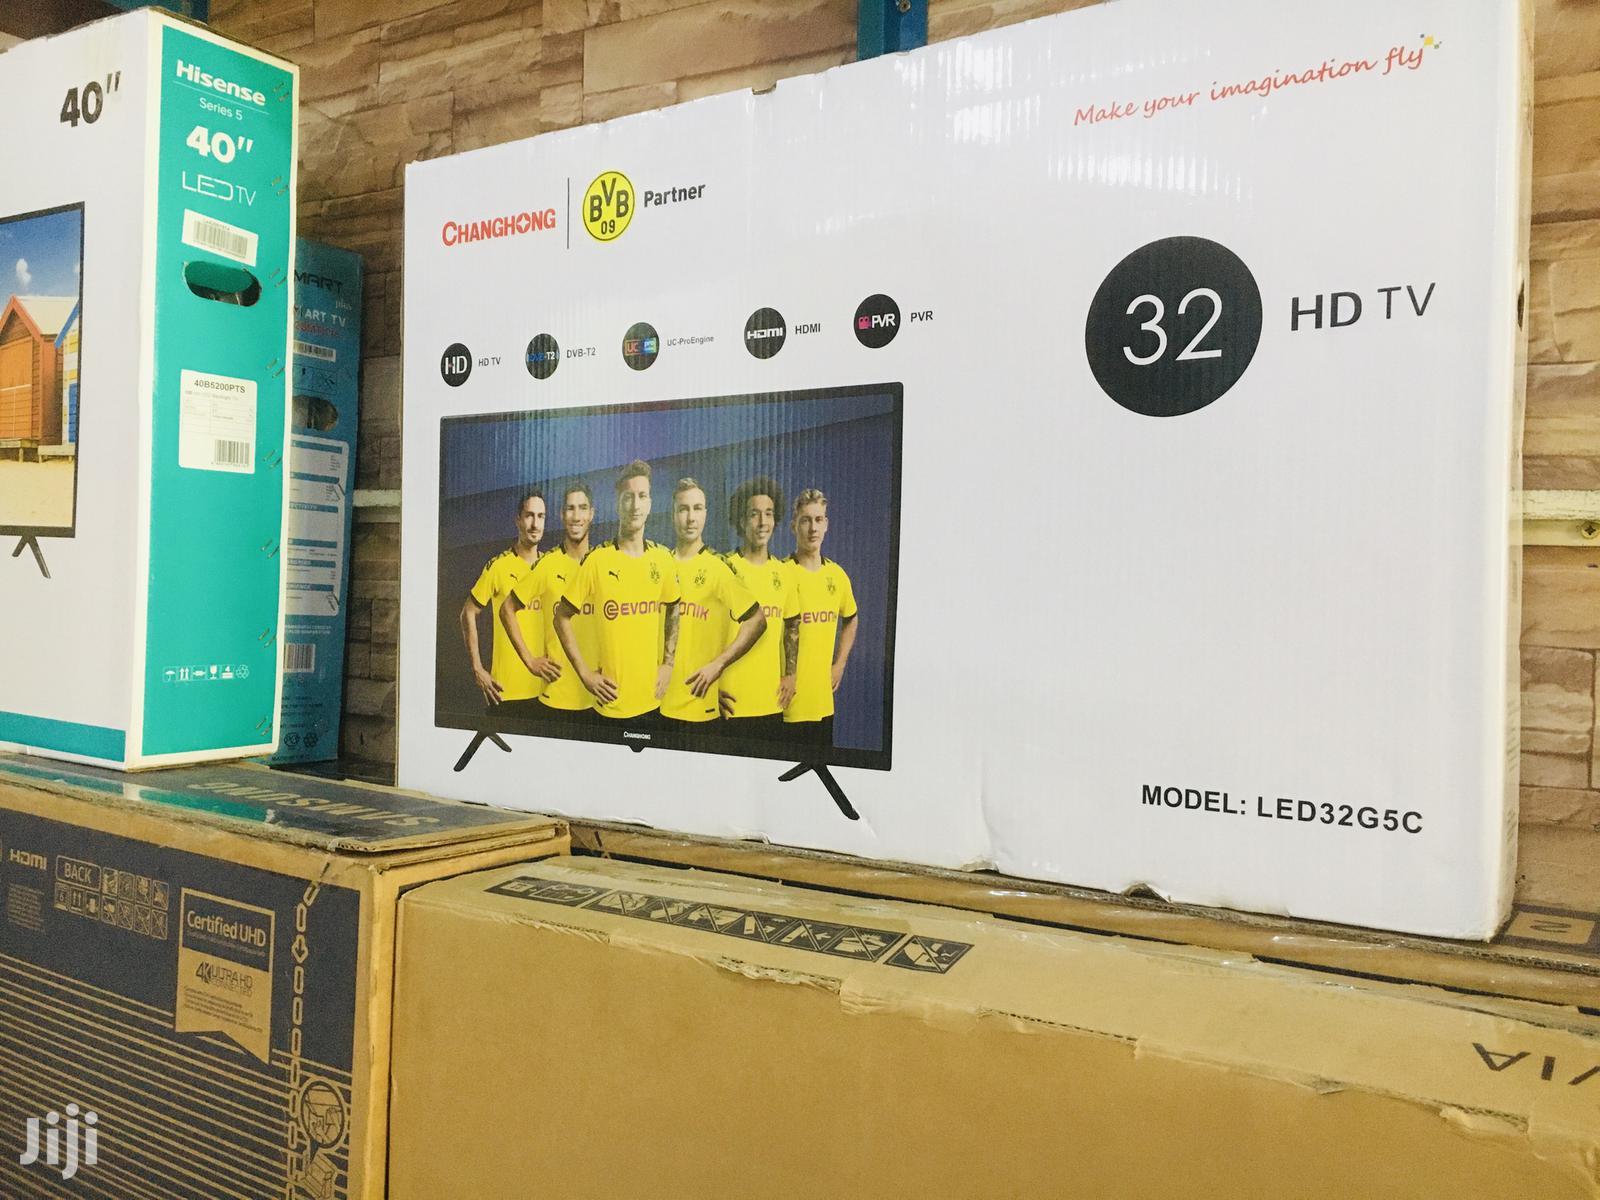 Changhong 32 Inches Digital Tv   TV & DVD Equipment for sale in Kampala, Uganda